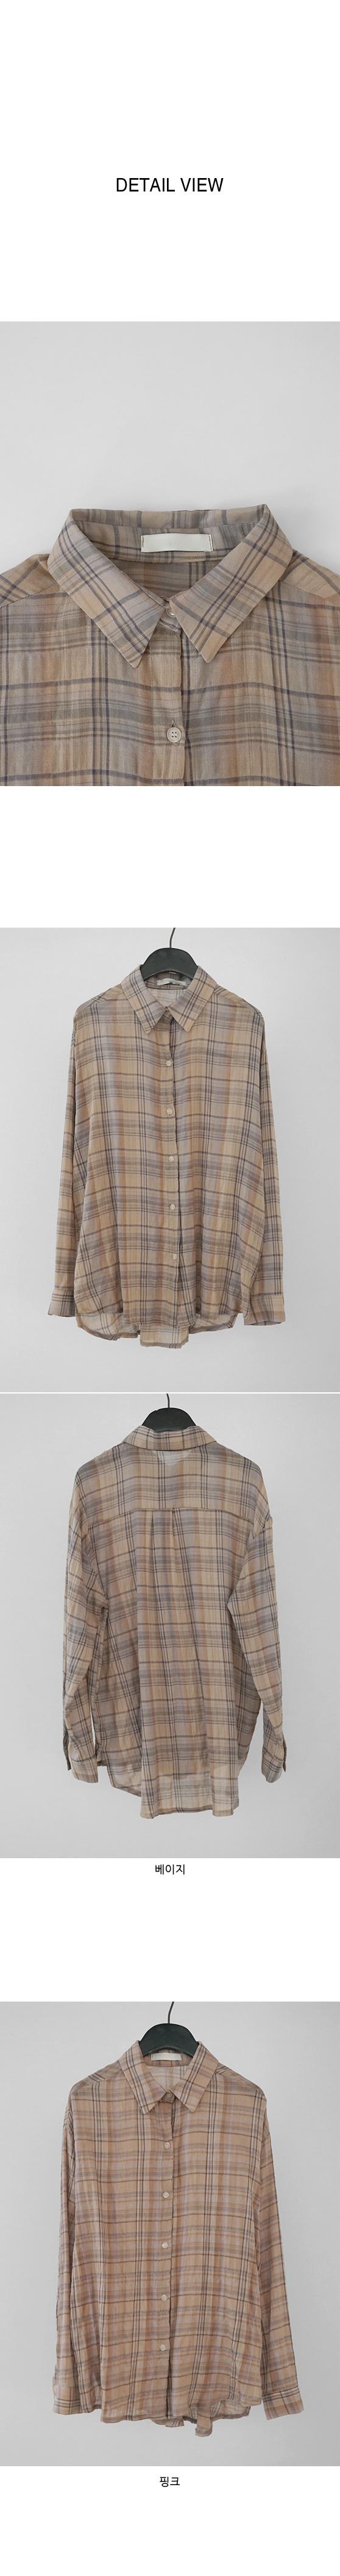 fade check shirt